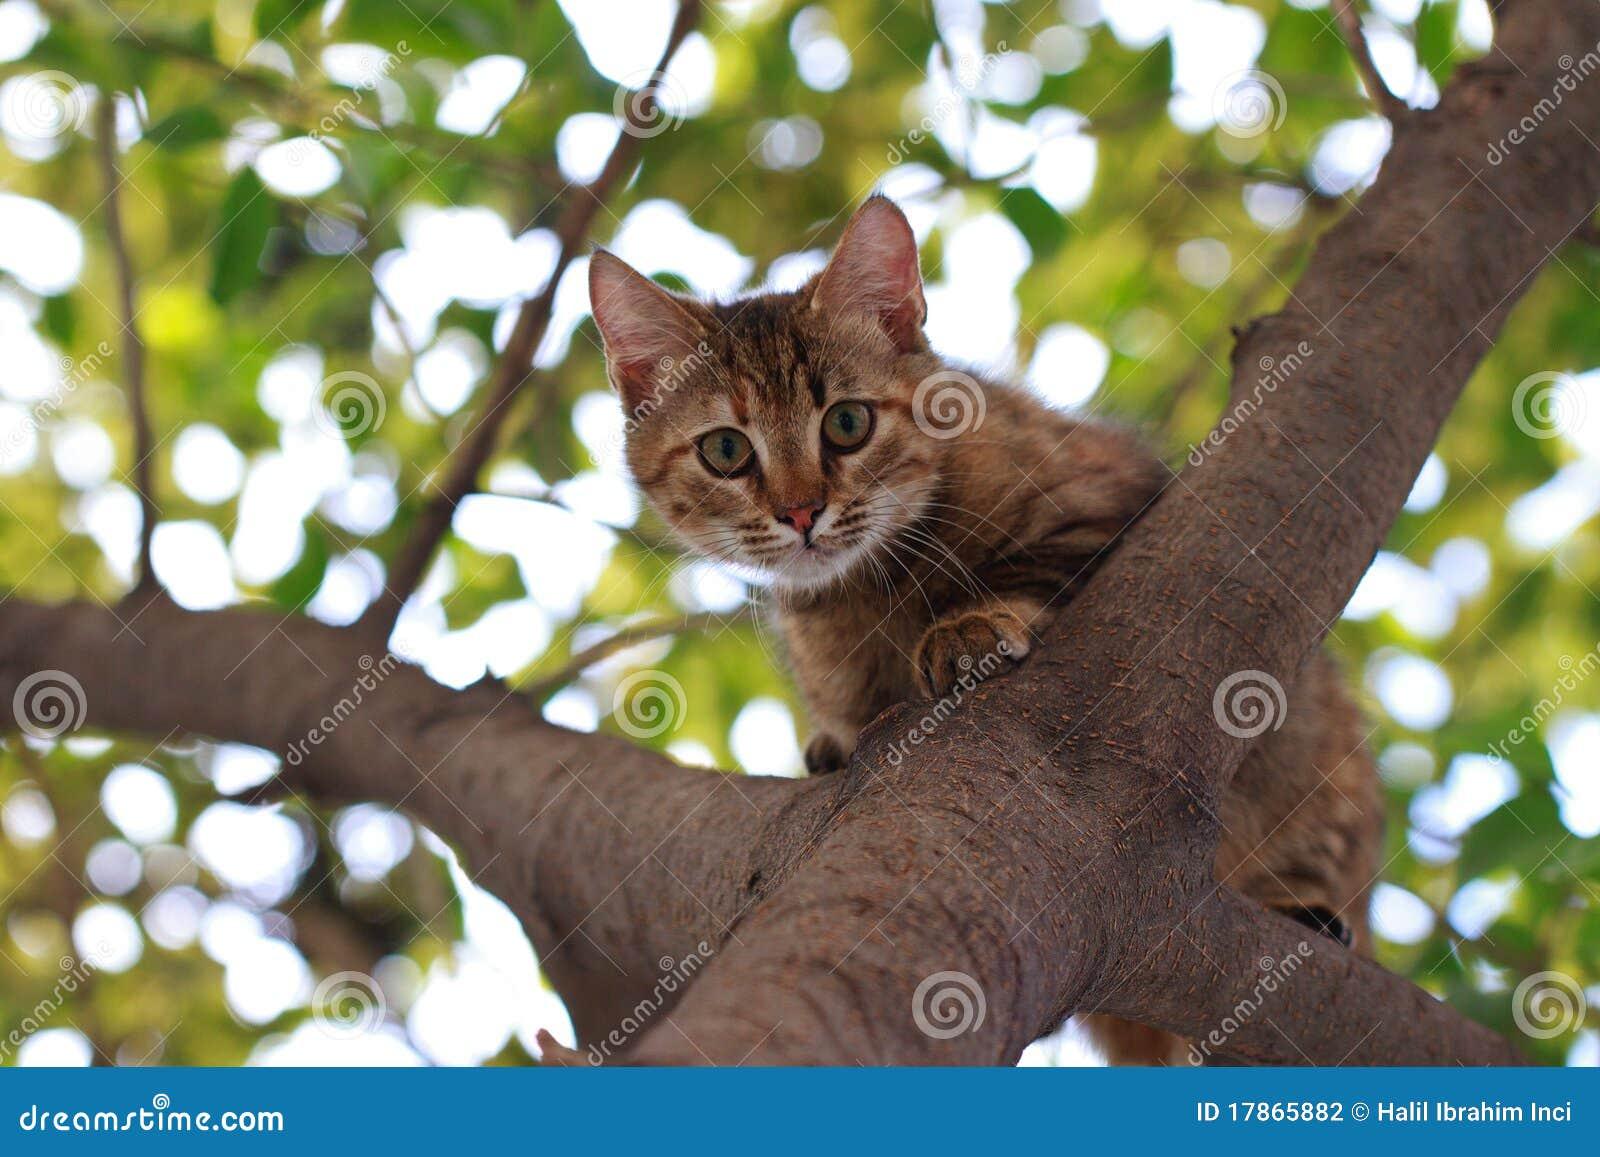 CAT ON TREE Stock Photography Image 17865882